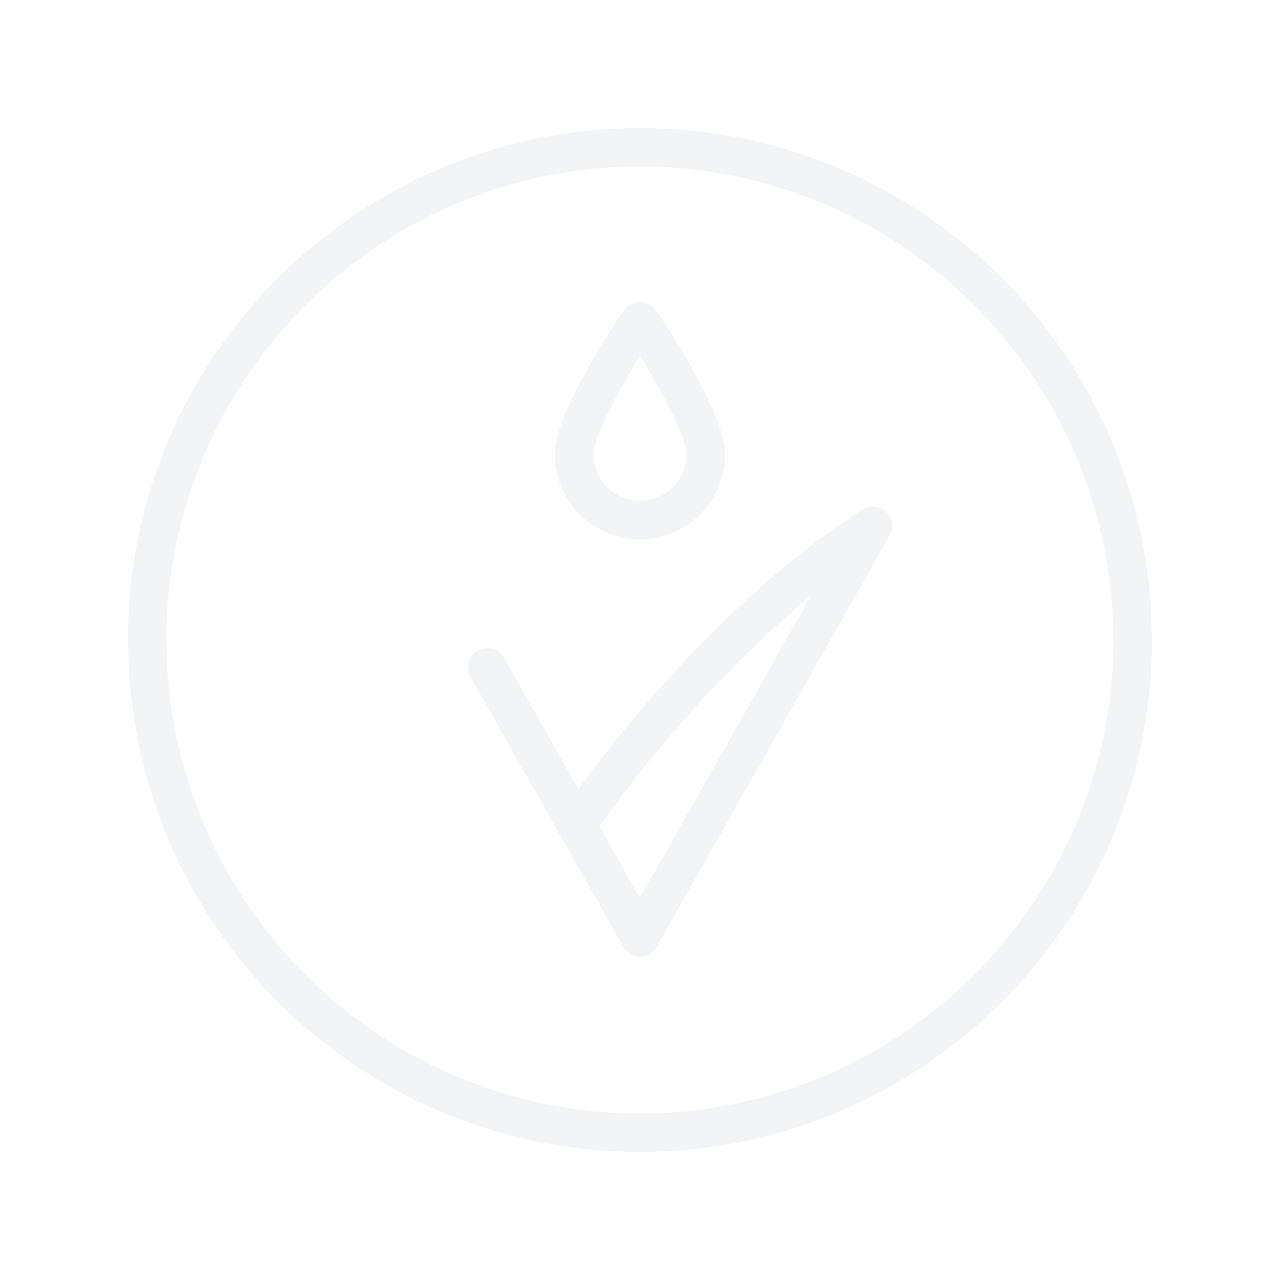 BOURJOIS Khol & Contour Eye Pencil No.007 Prunissime 1.2g